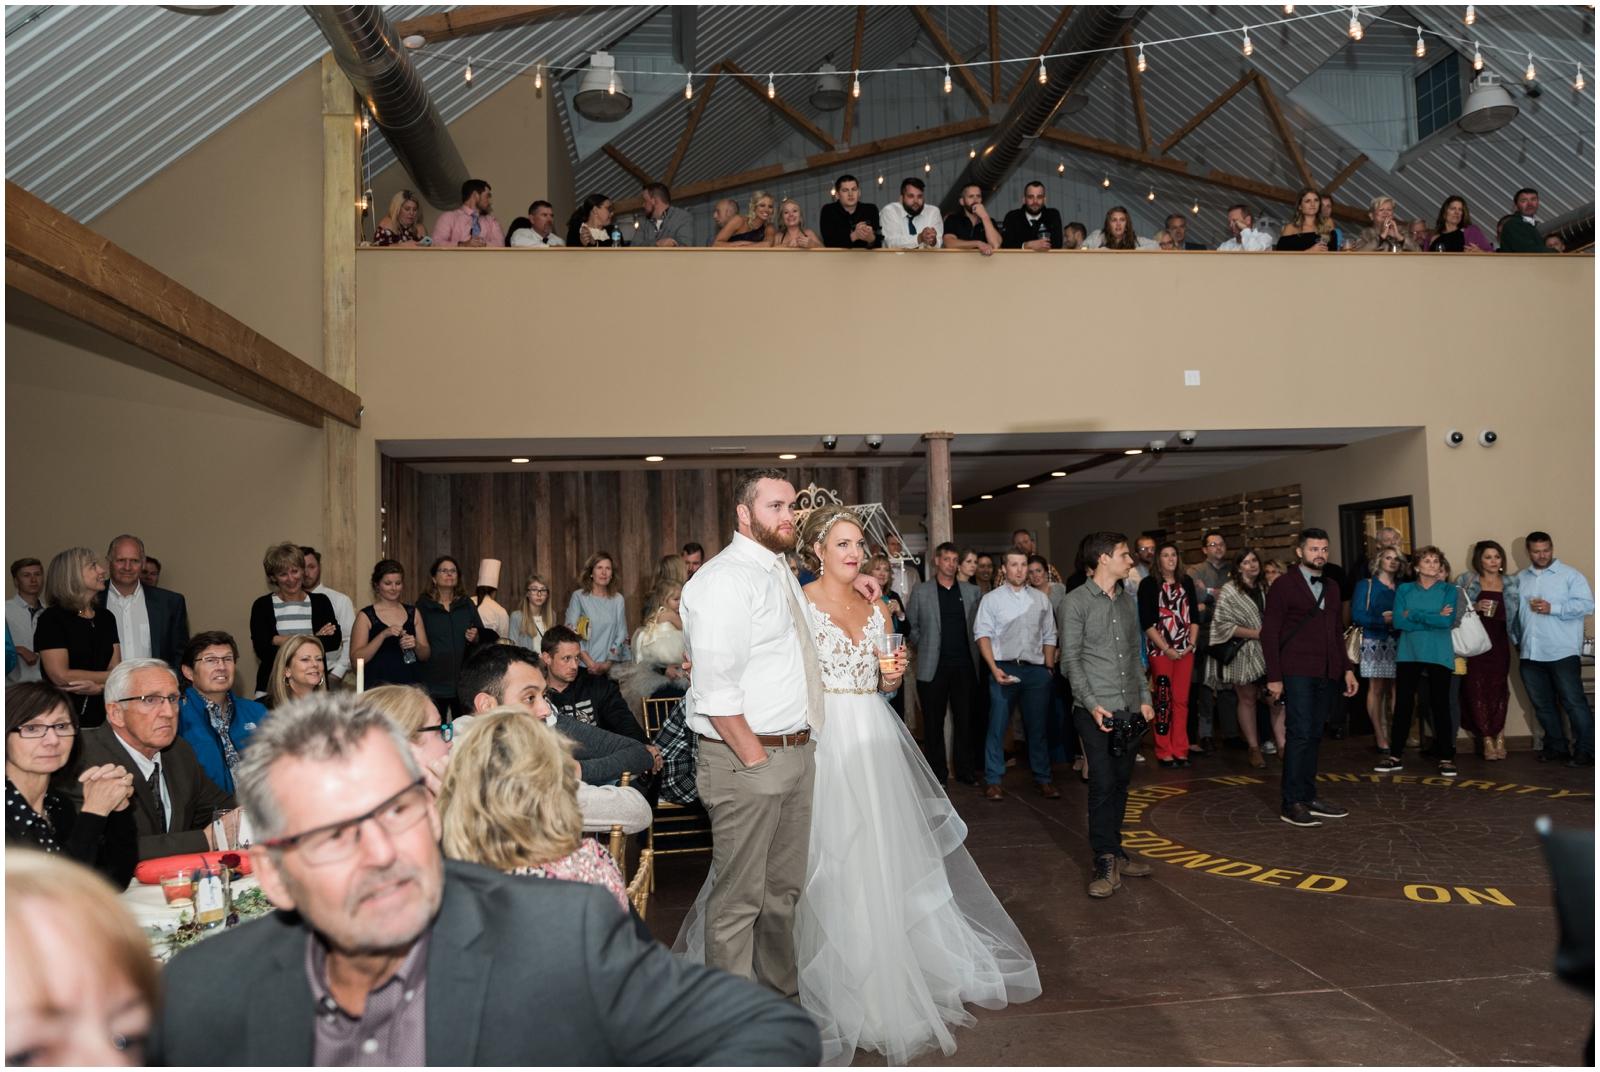 Minnesota-Wedding-Venue- Chaska-MN-Rustic-Barn-Weddings_0599.jpg